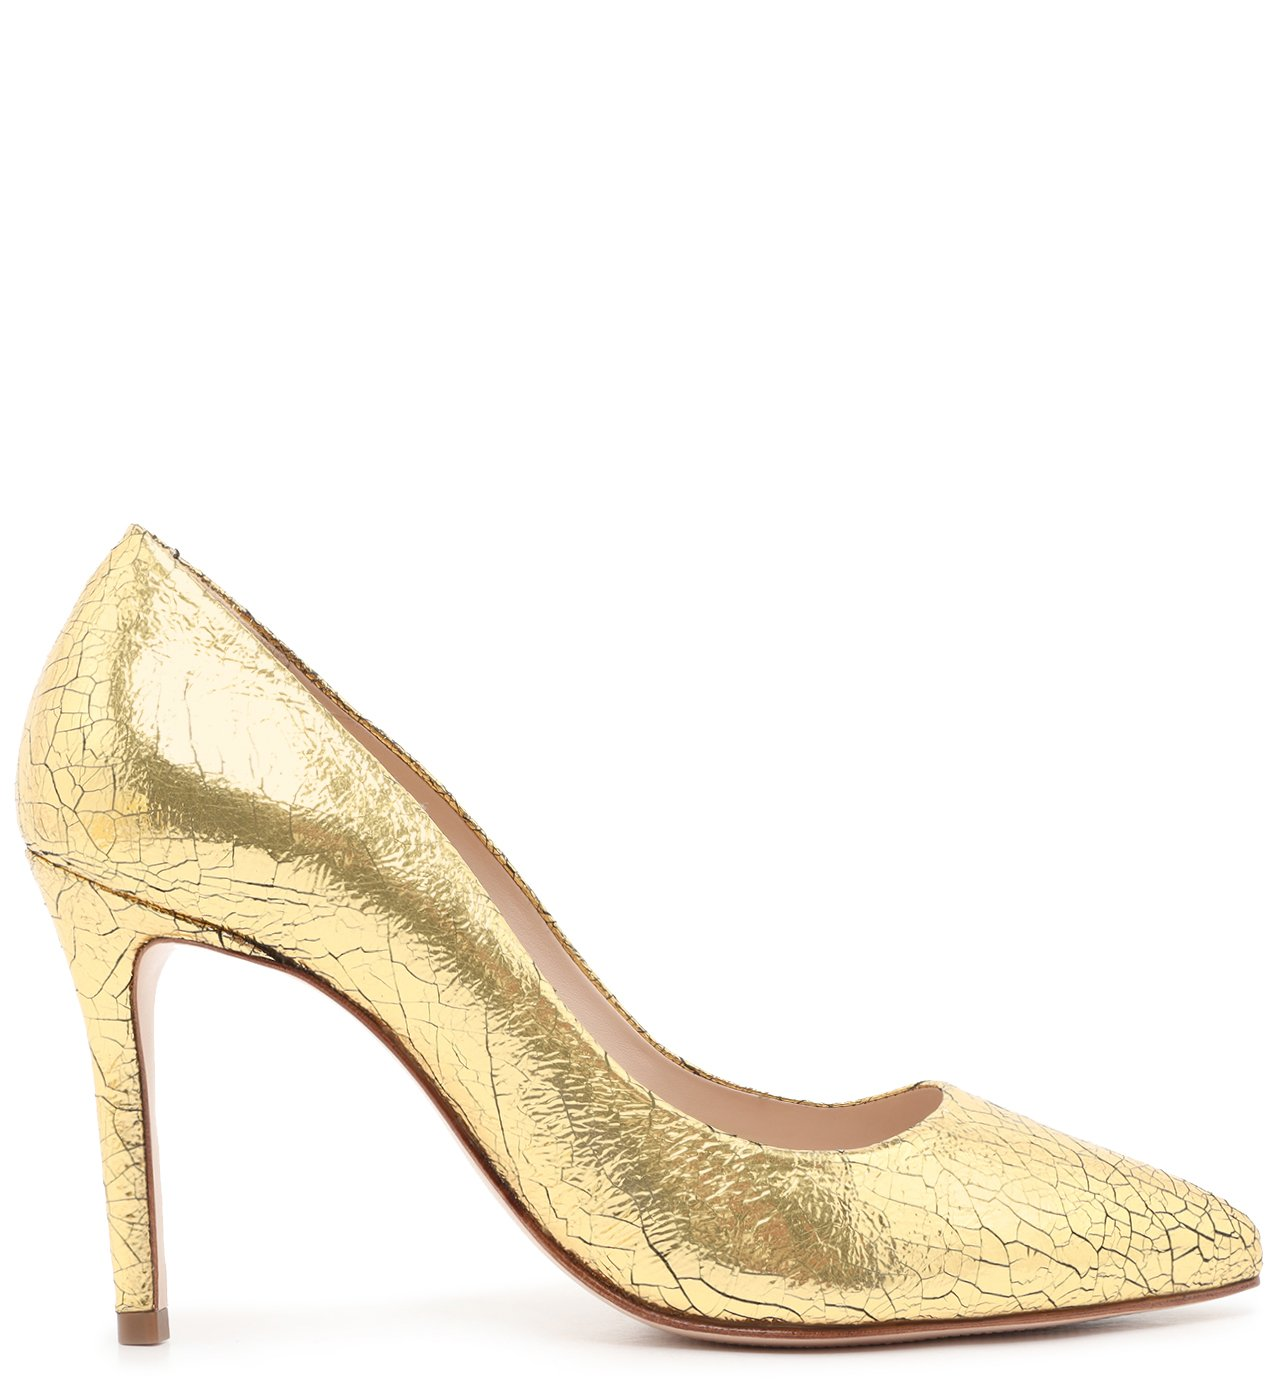 Scarpin Classic Metallic Ouro | Schutz